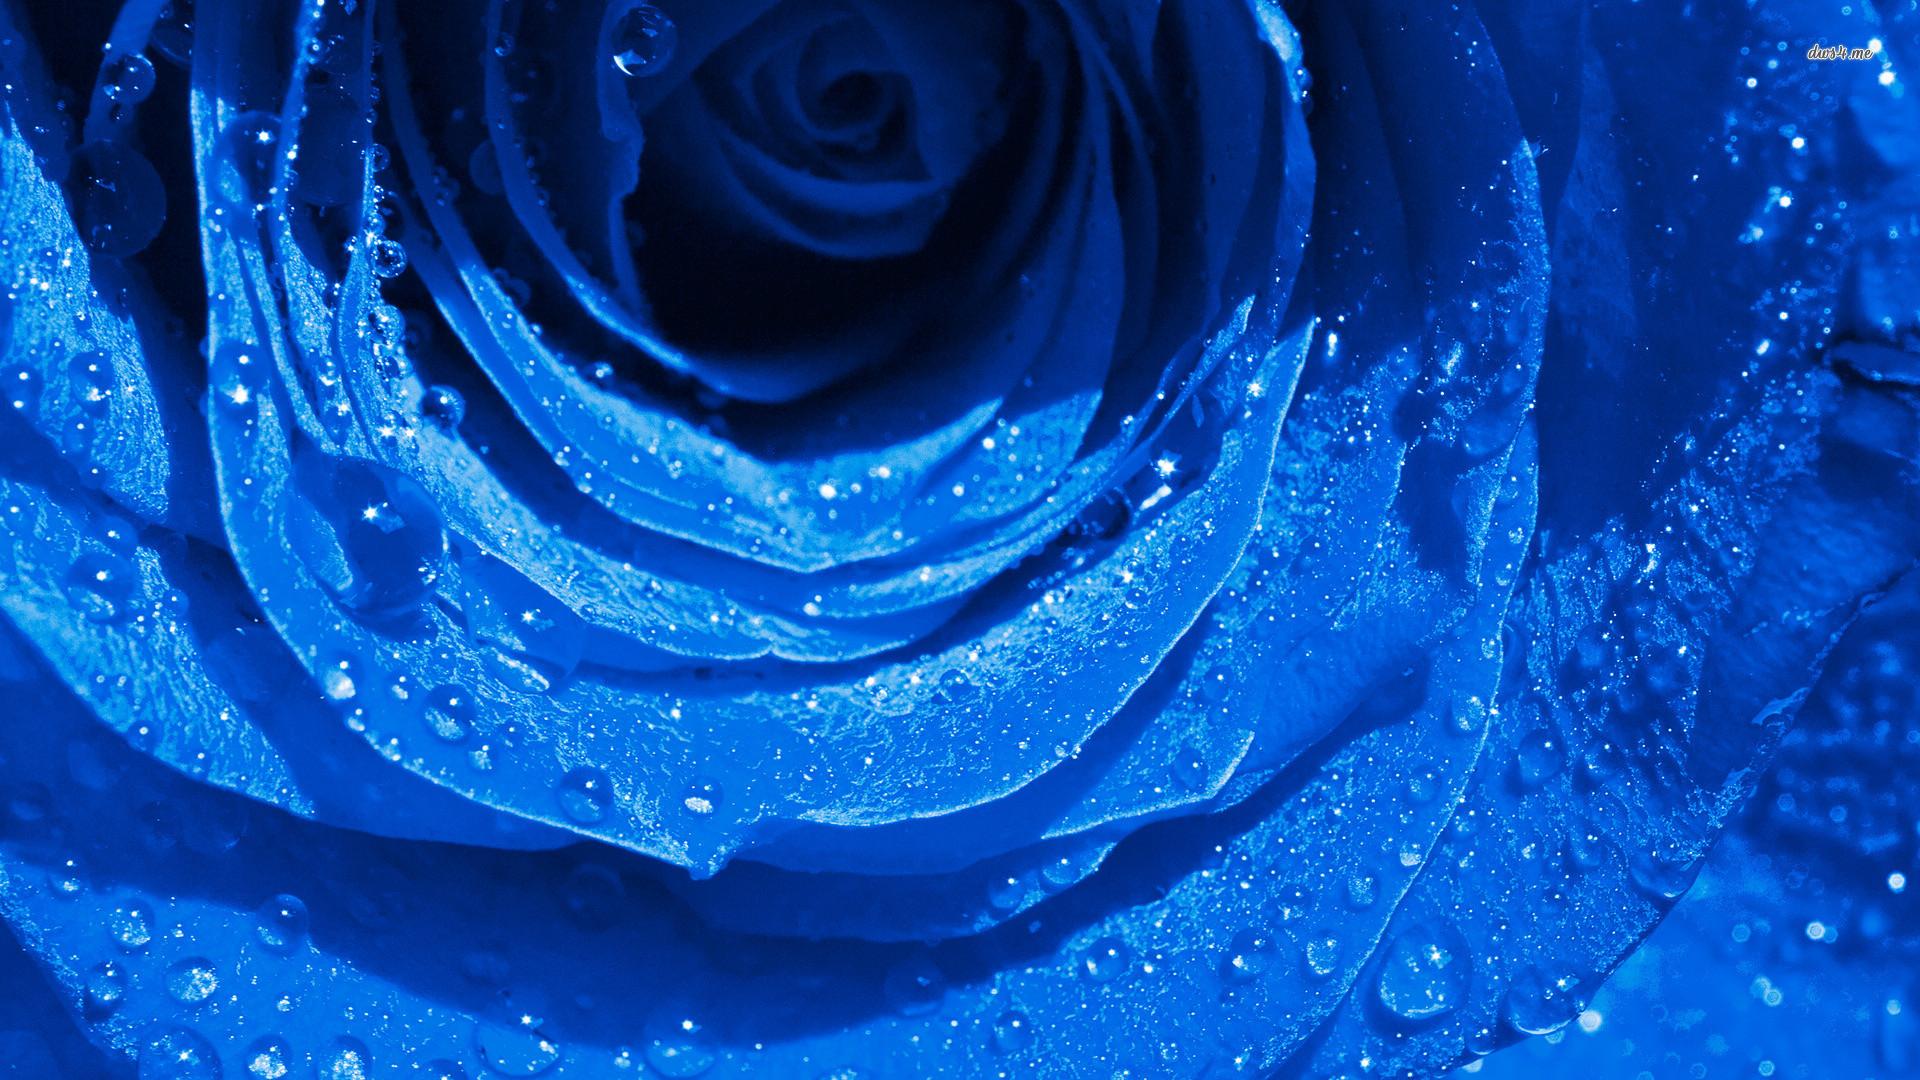 Xiaomi Wallpaper Blue Black: Blue Rose Background ·①